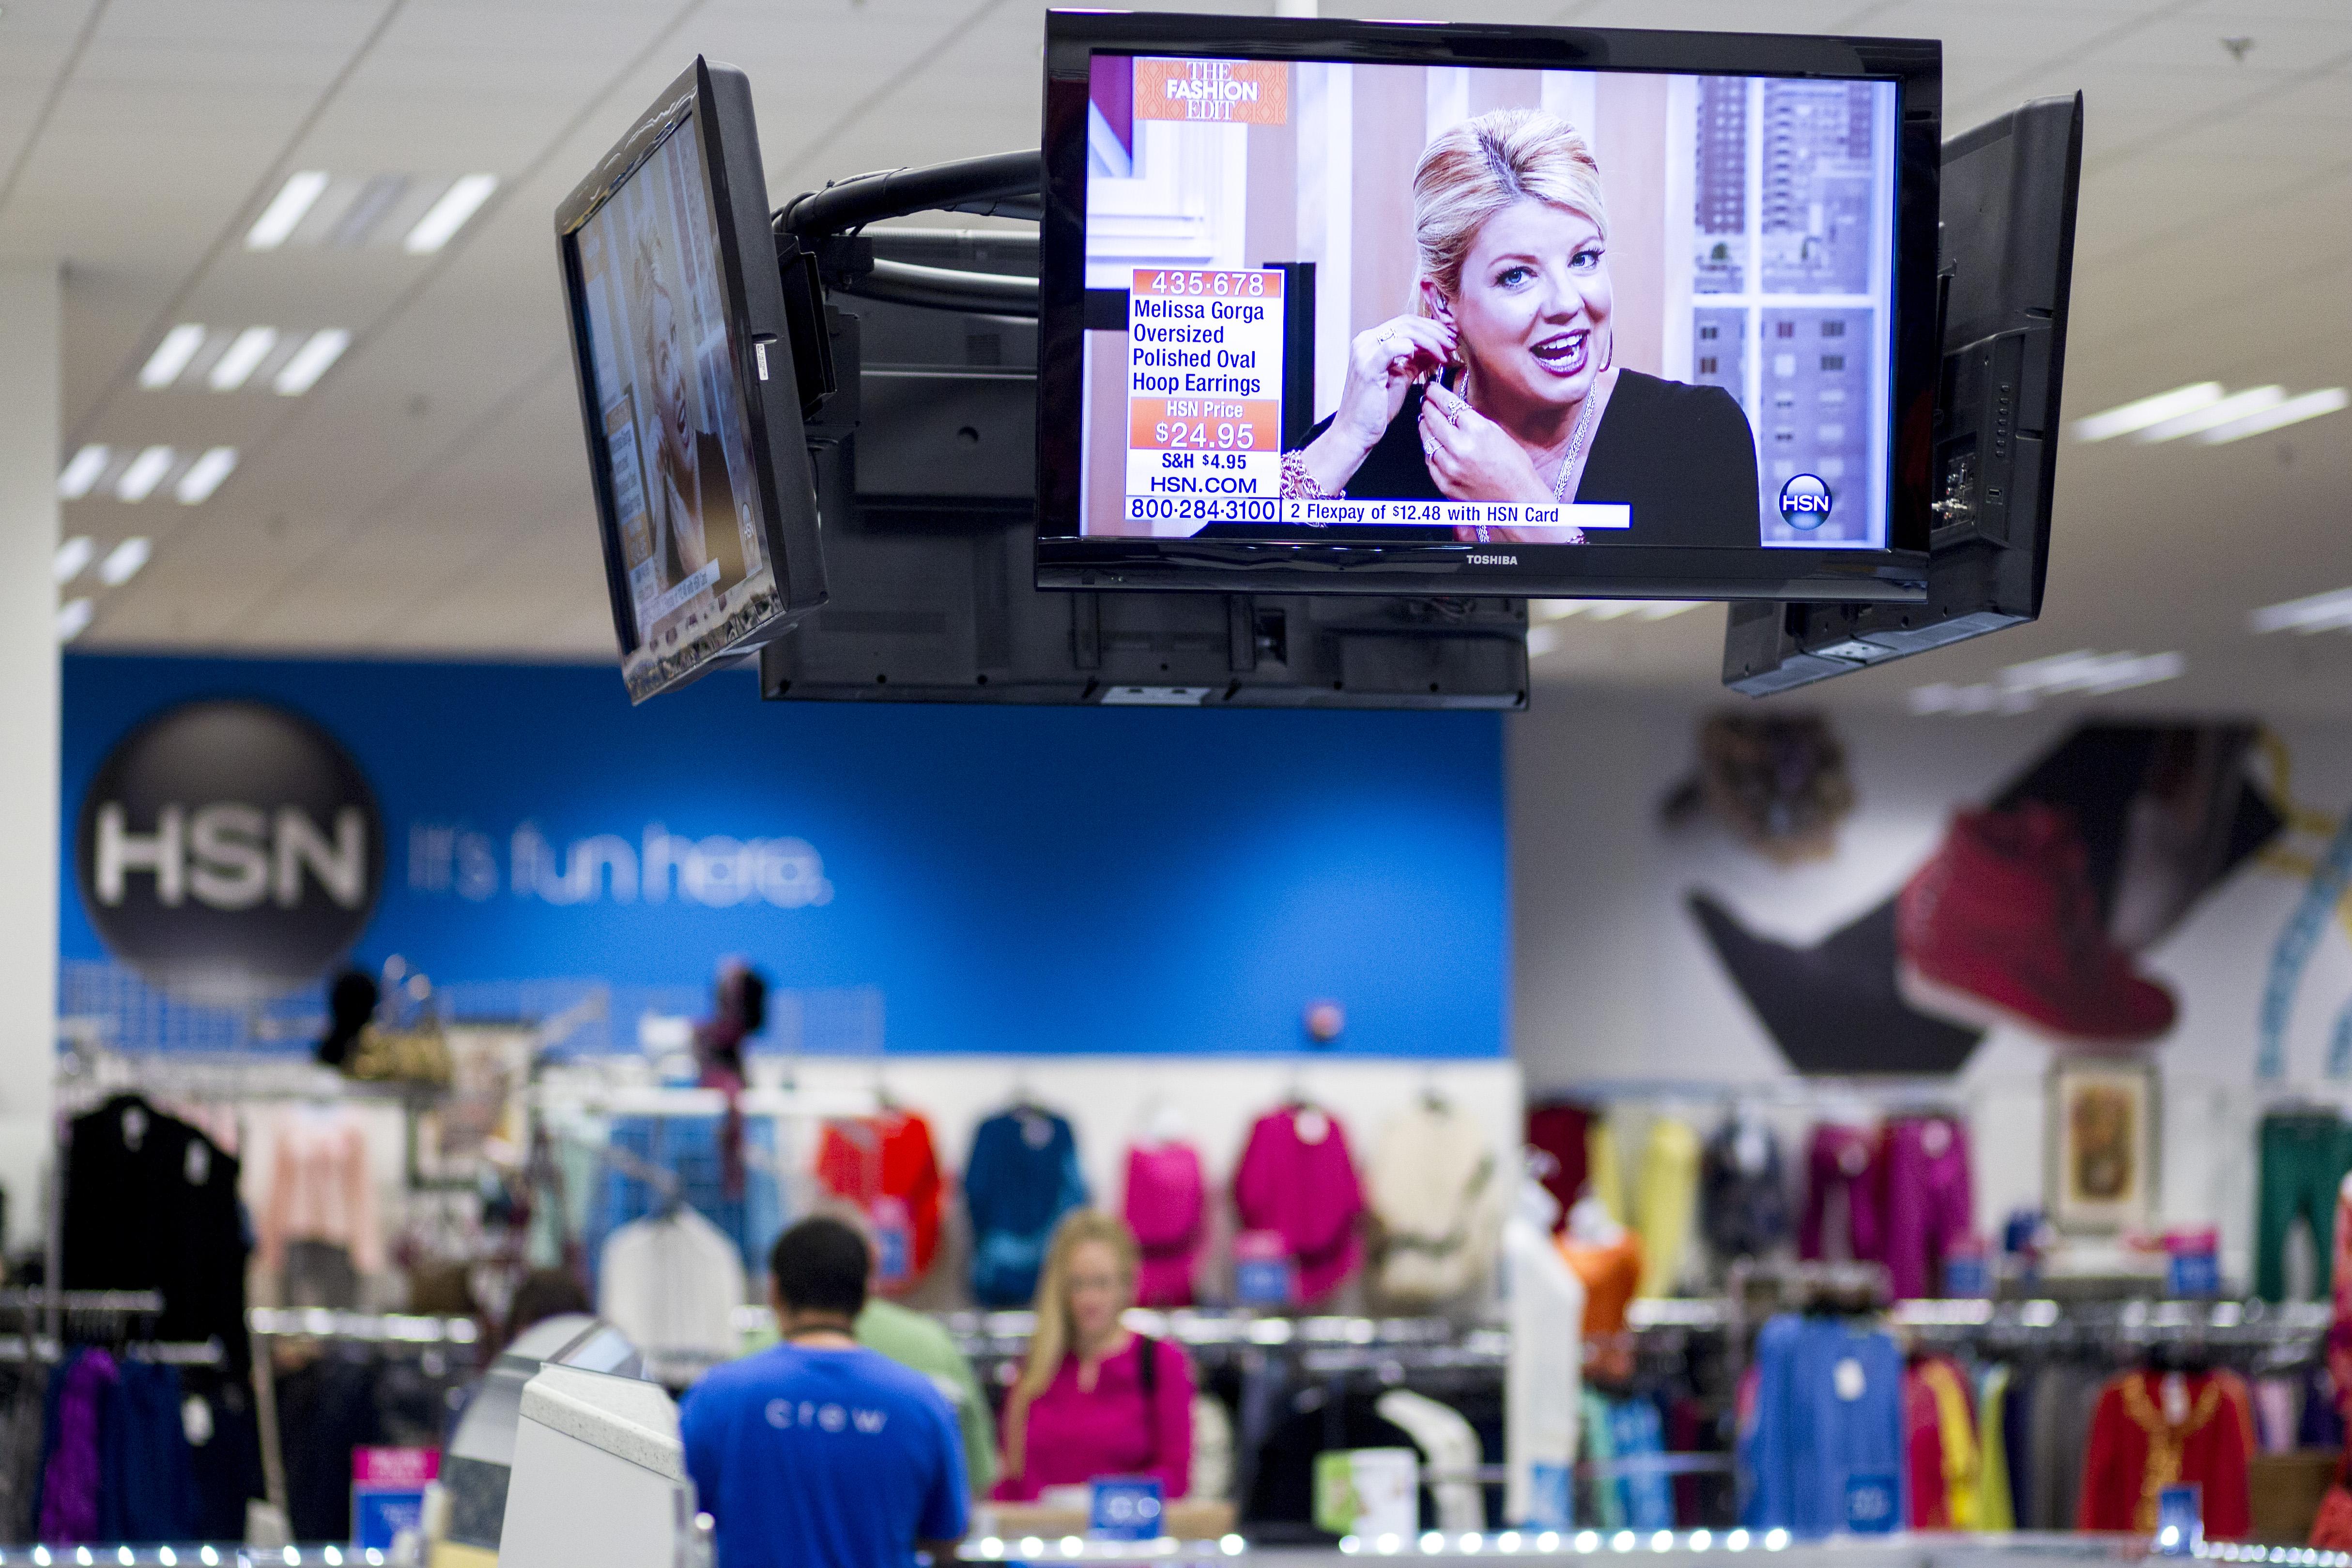 Hsn shopping network online